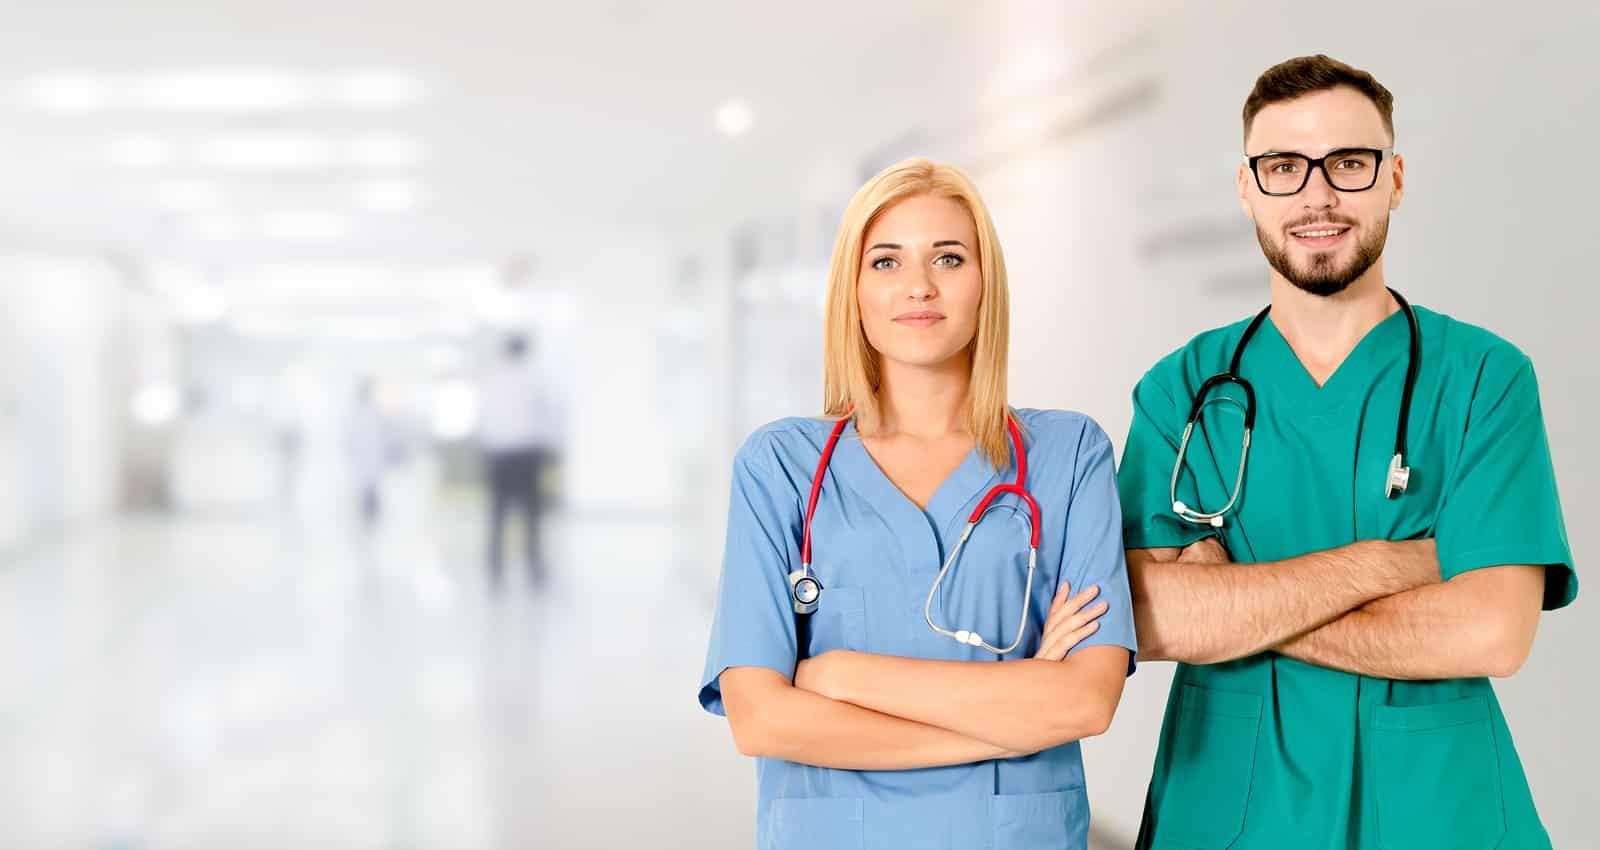 Doctors at hospital